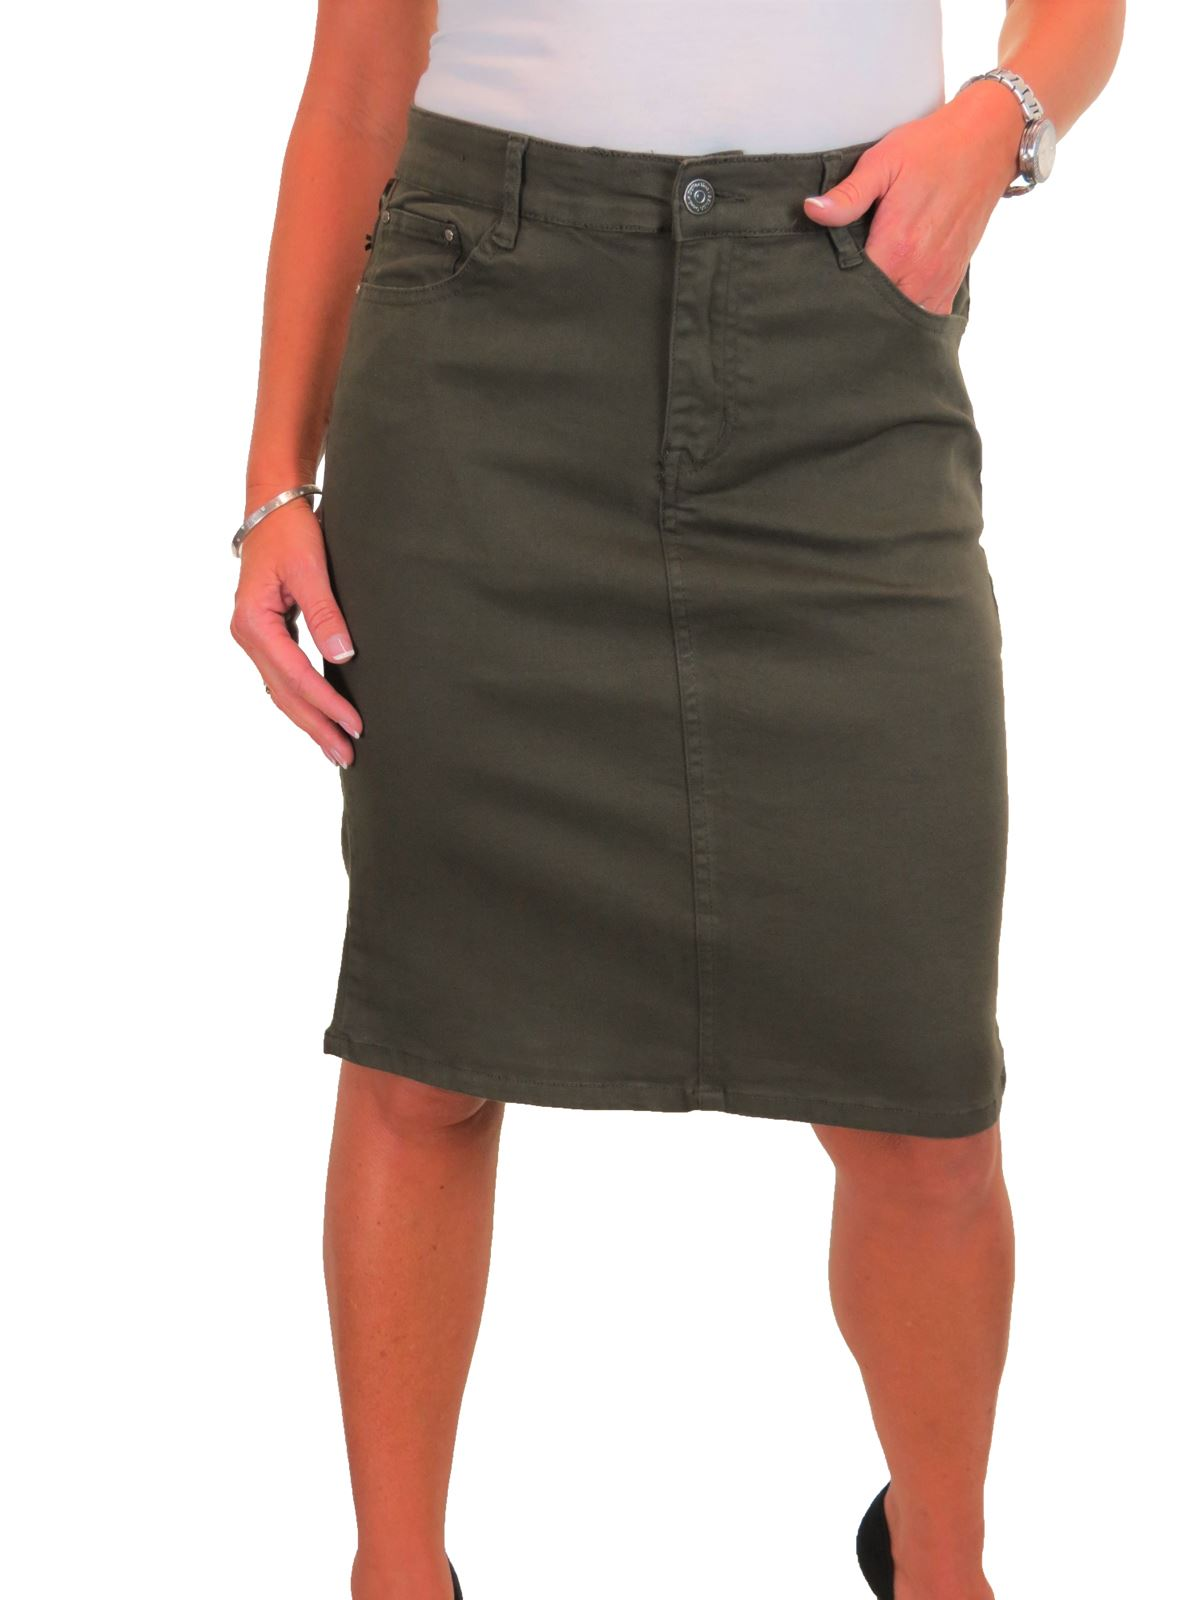 ICE-Womens-Good-Stretch-Jeans-Skirt-Knee-Length-14-22 thumbnail 13